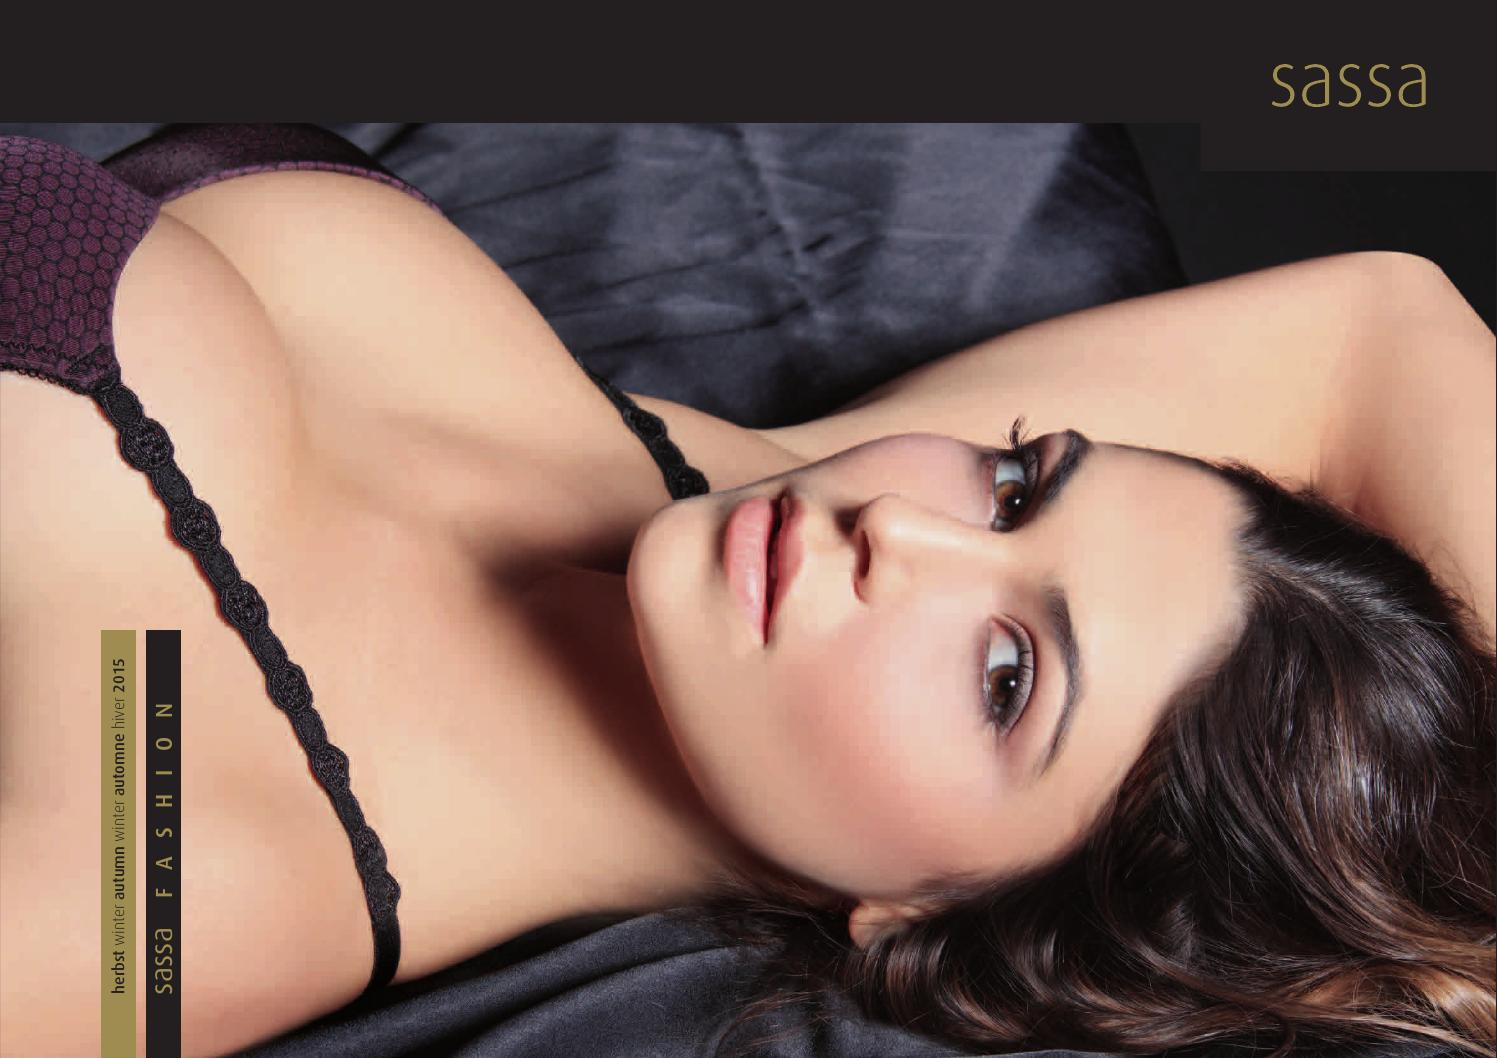 katalog sex naken